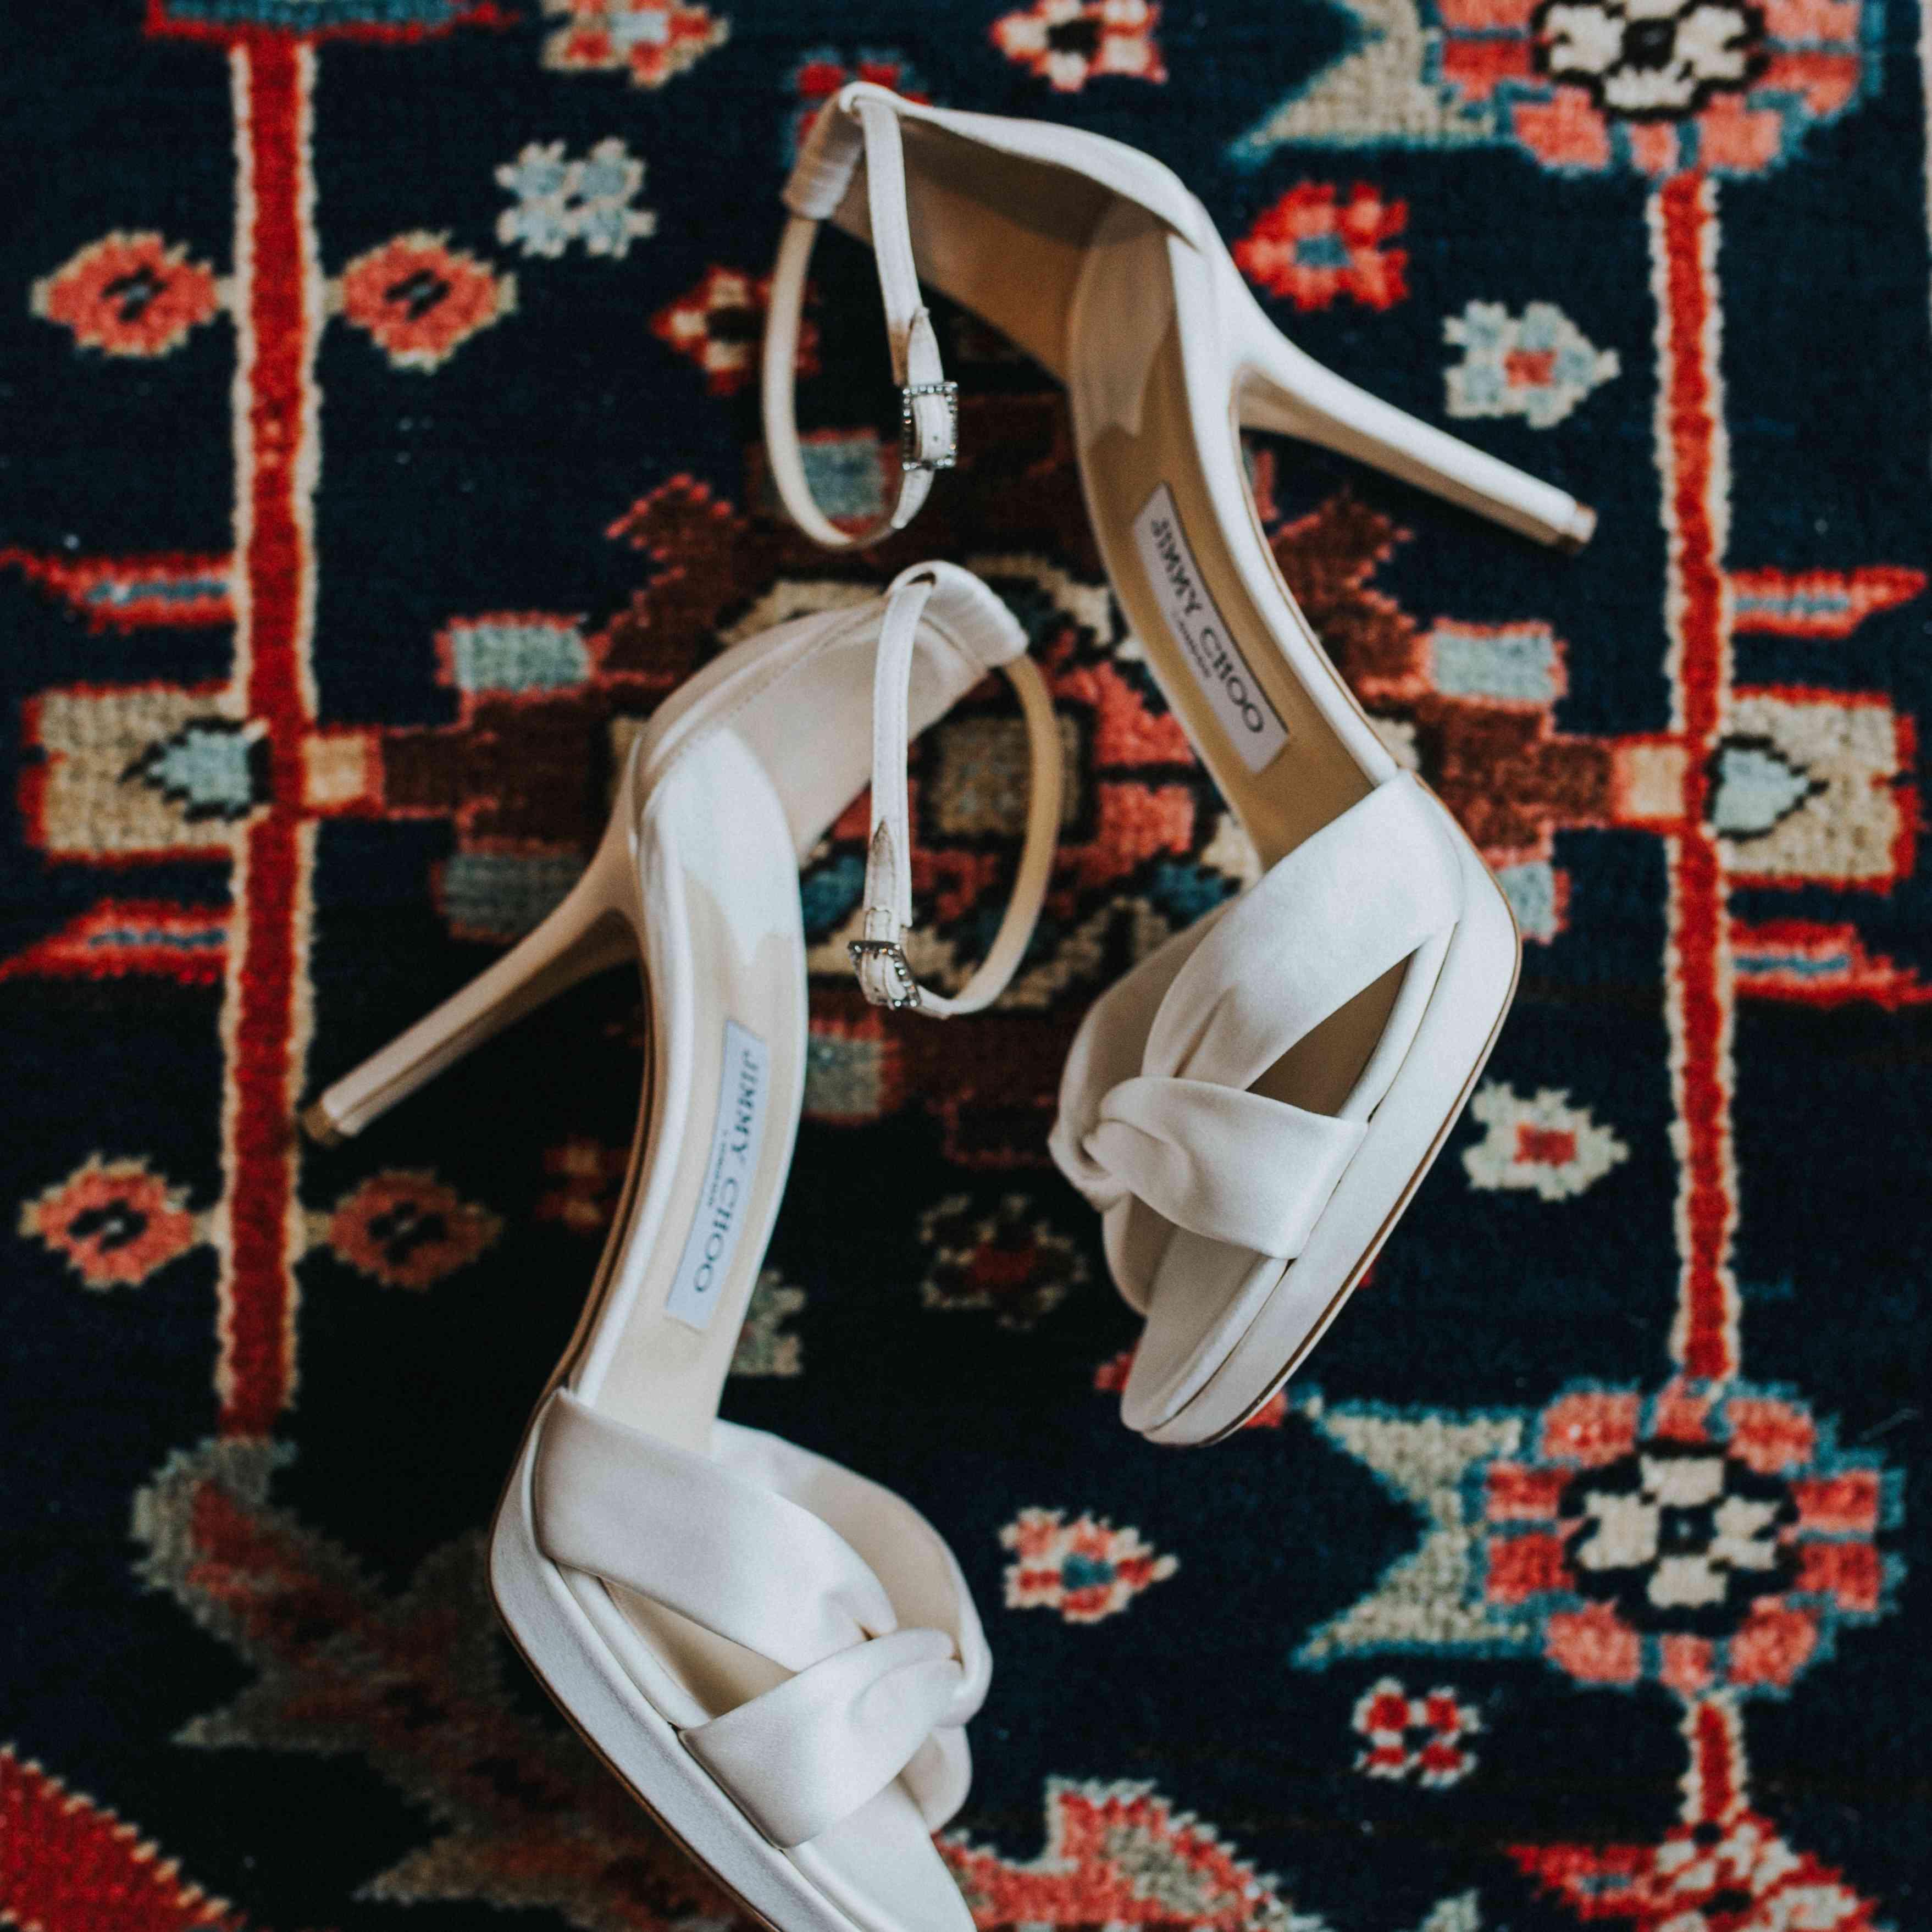 Jimmy Choo Satin Sandals